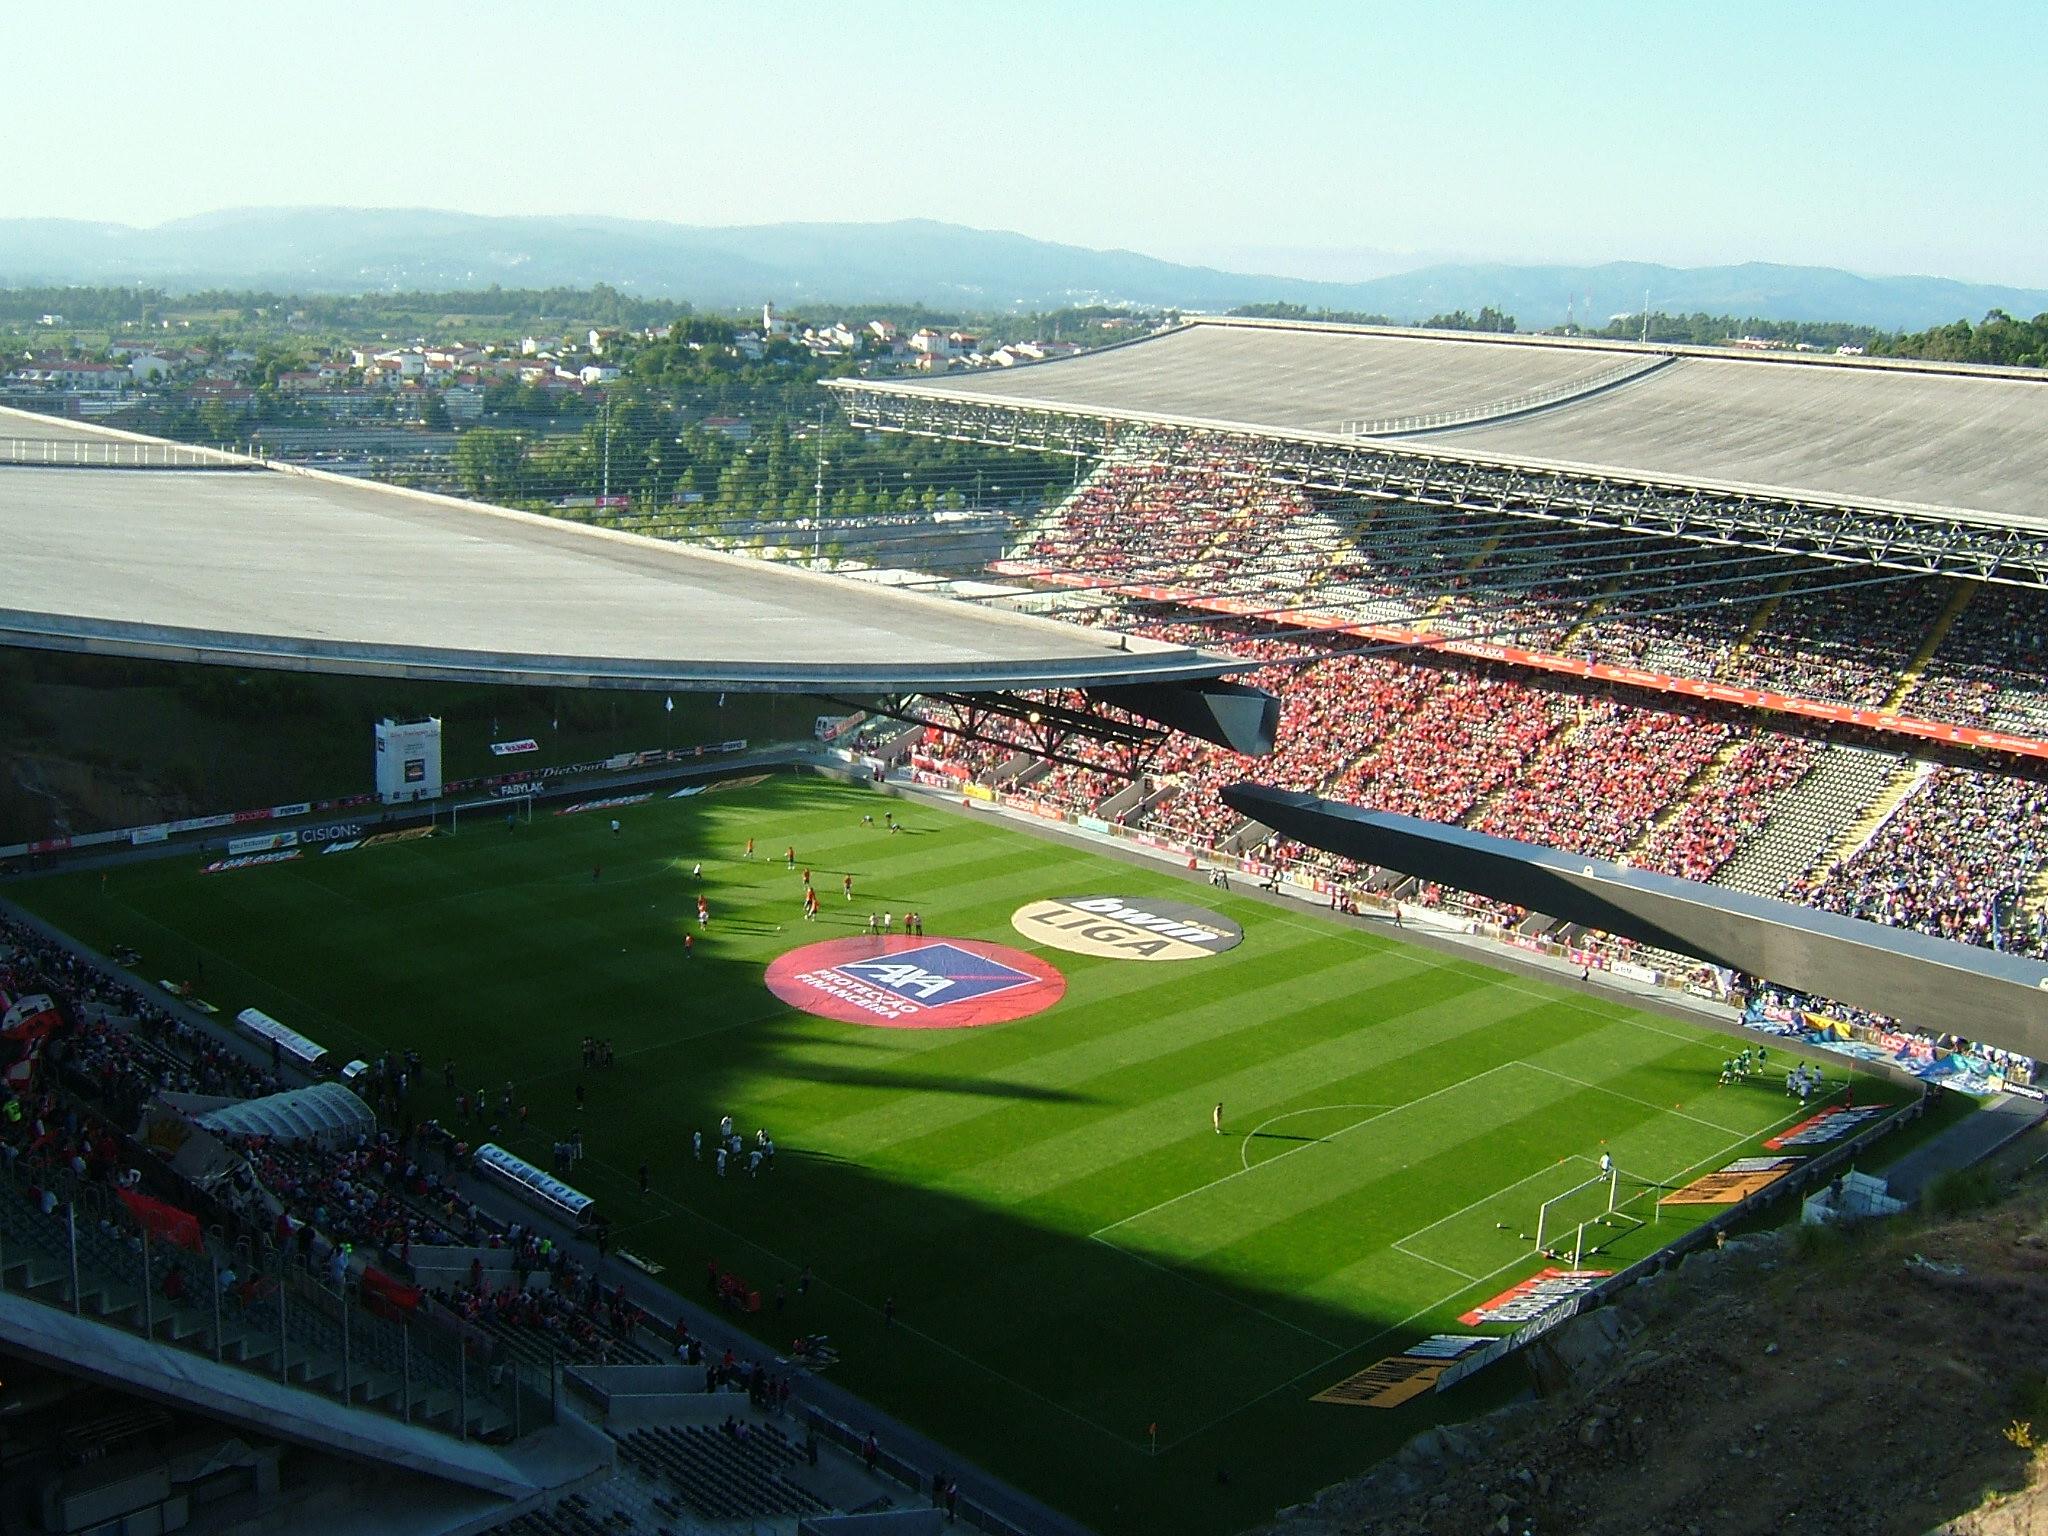 amsterdam stadium (41)